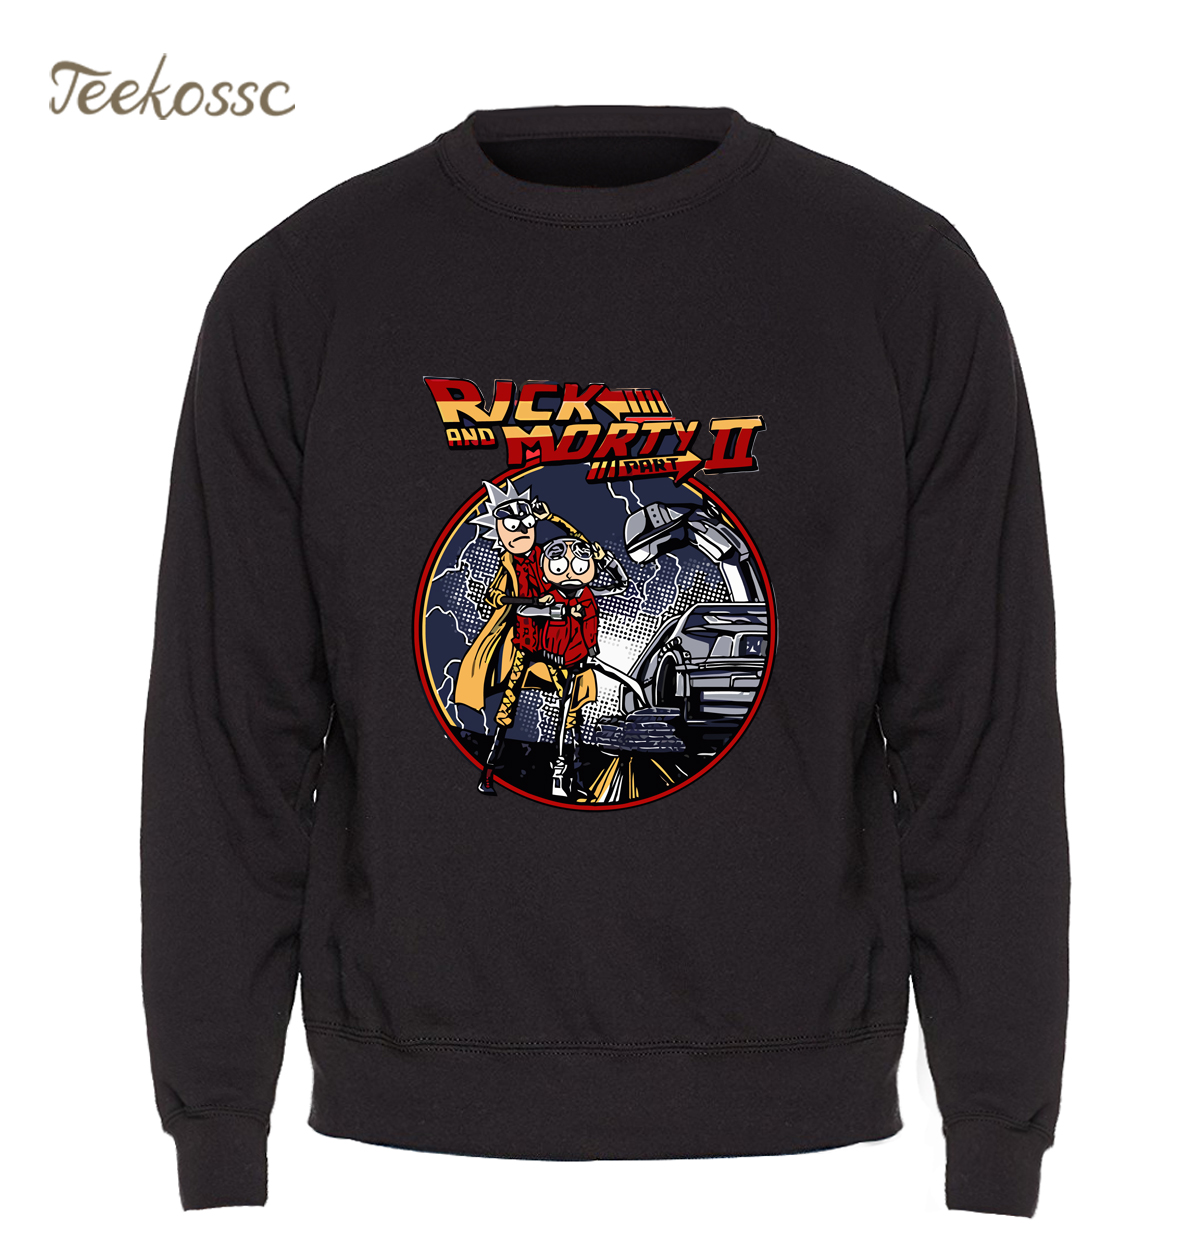 Rick and Morty HoodieMen Back to the future Sweatshirt Anime Funny Crewneck Sweatshirts Winter Autumn Harajuku Black Sportswear